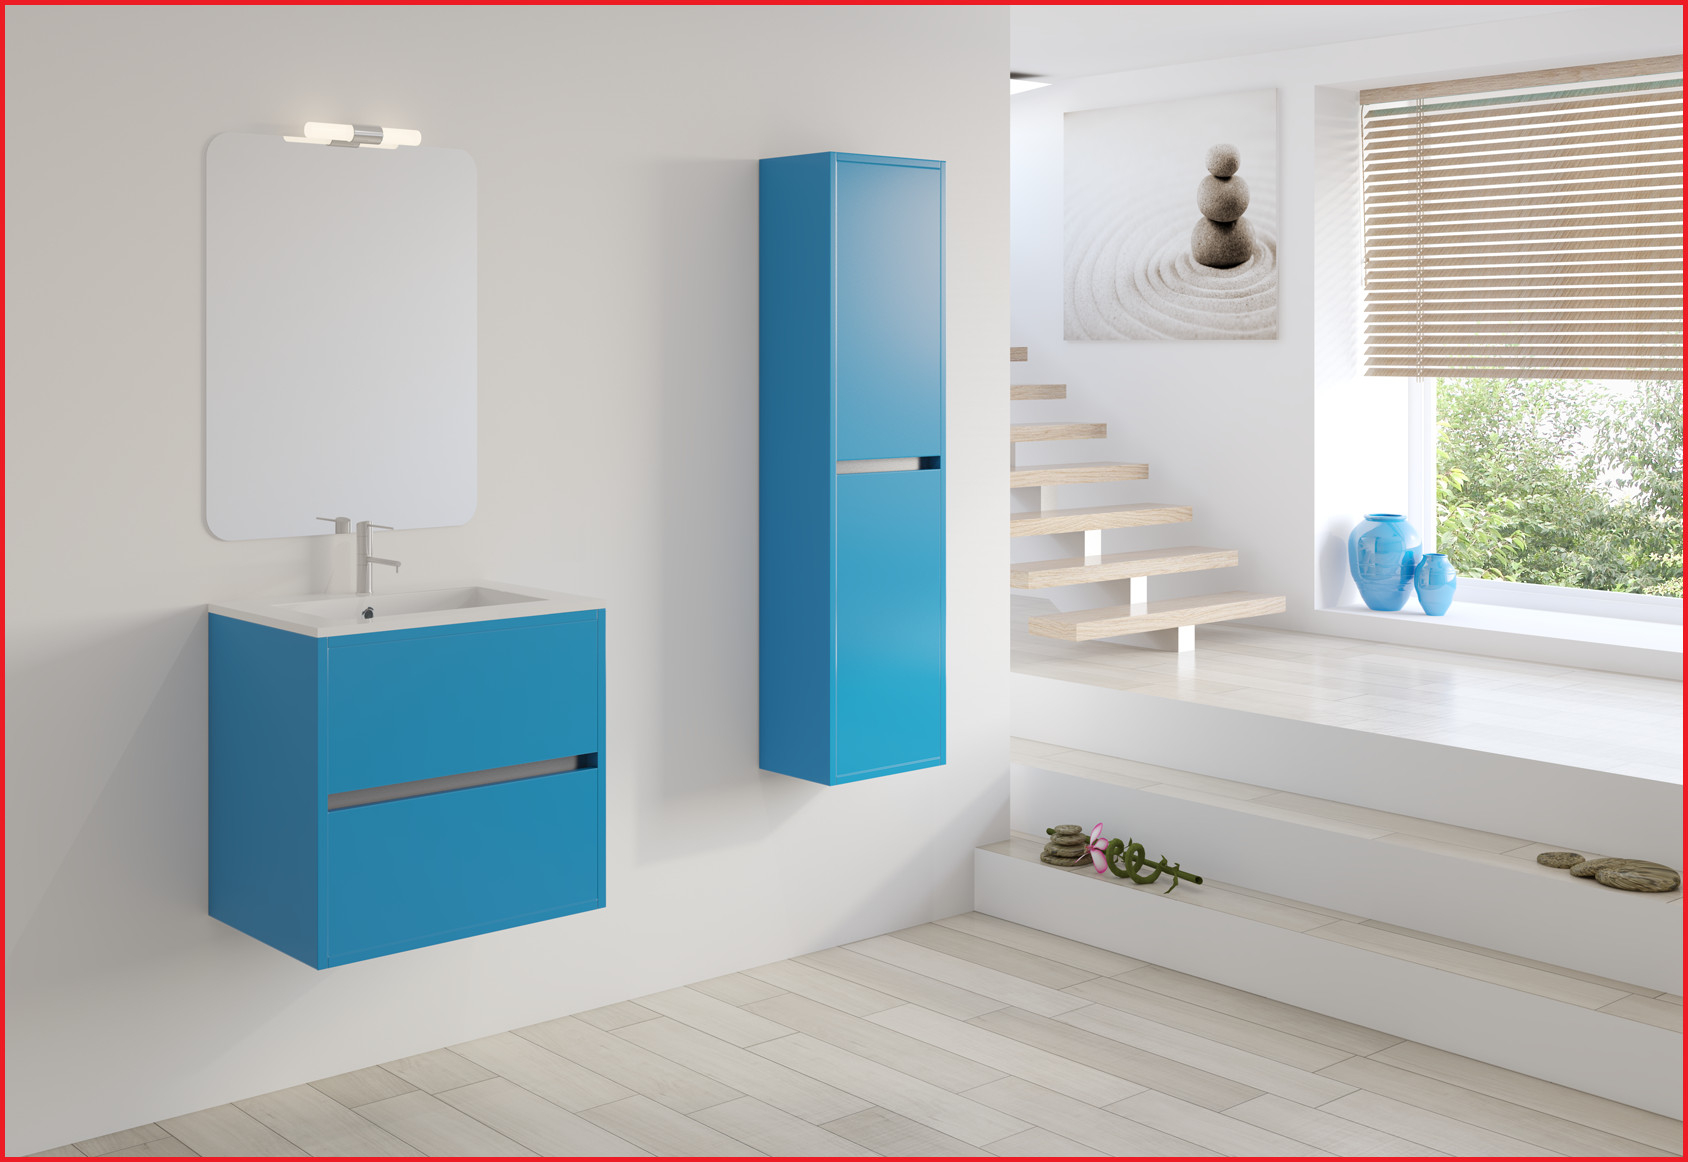 Mueble Baño Azul Ffdn Muebles De Baà O De 60 Cm Muebles De Bano Azul DiseOs